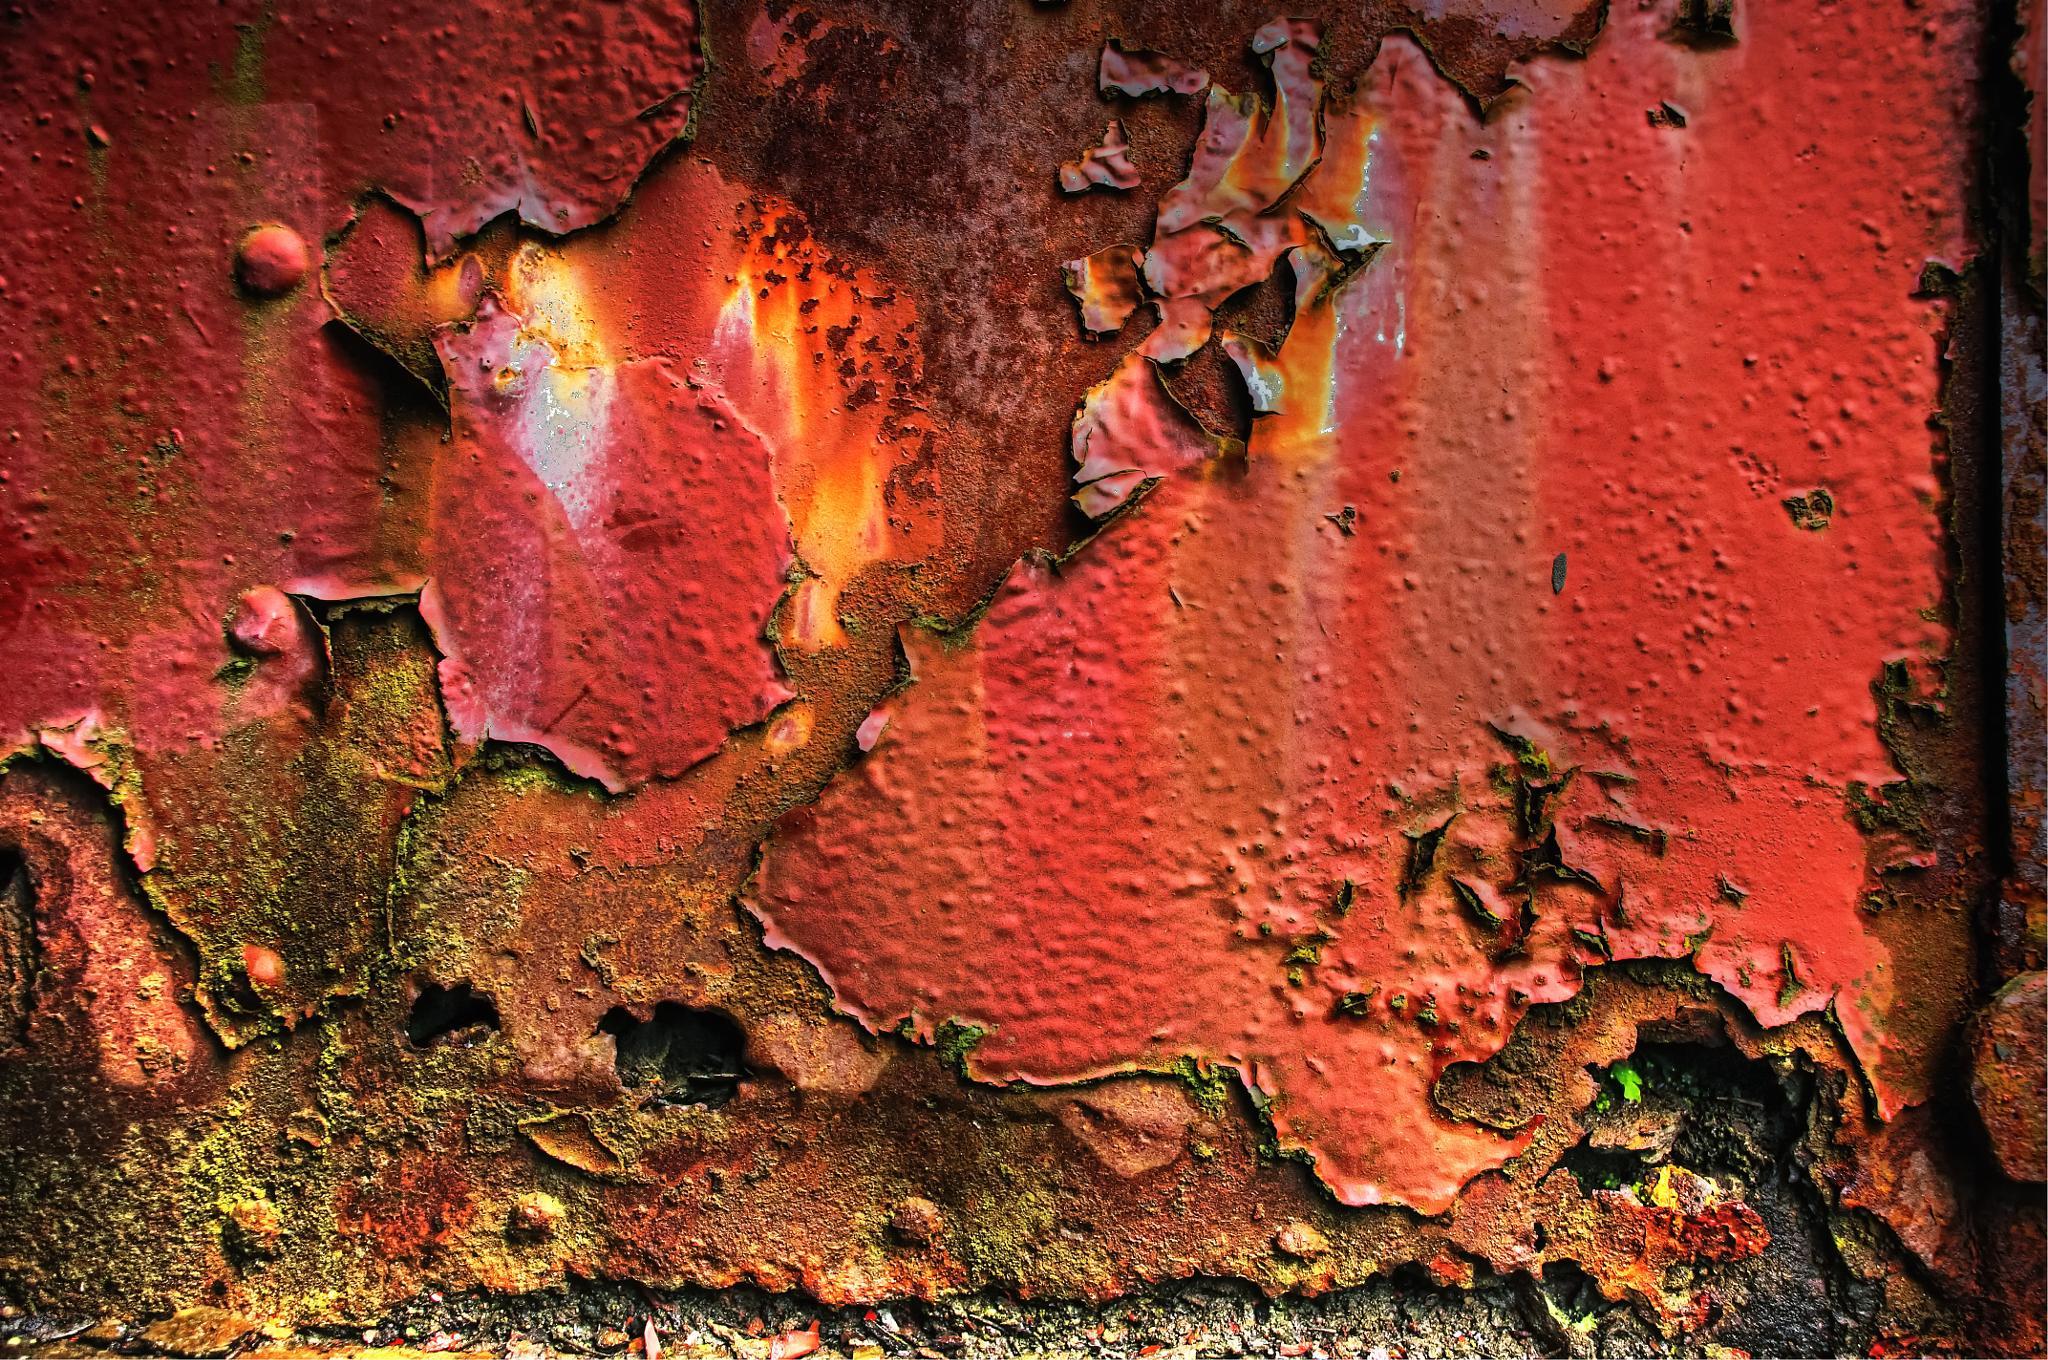 The Flame by Dana Scott